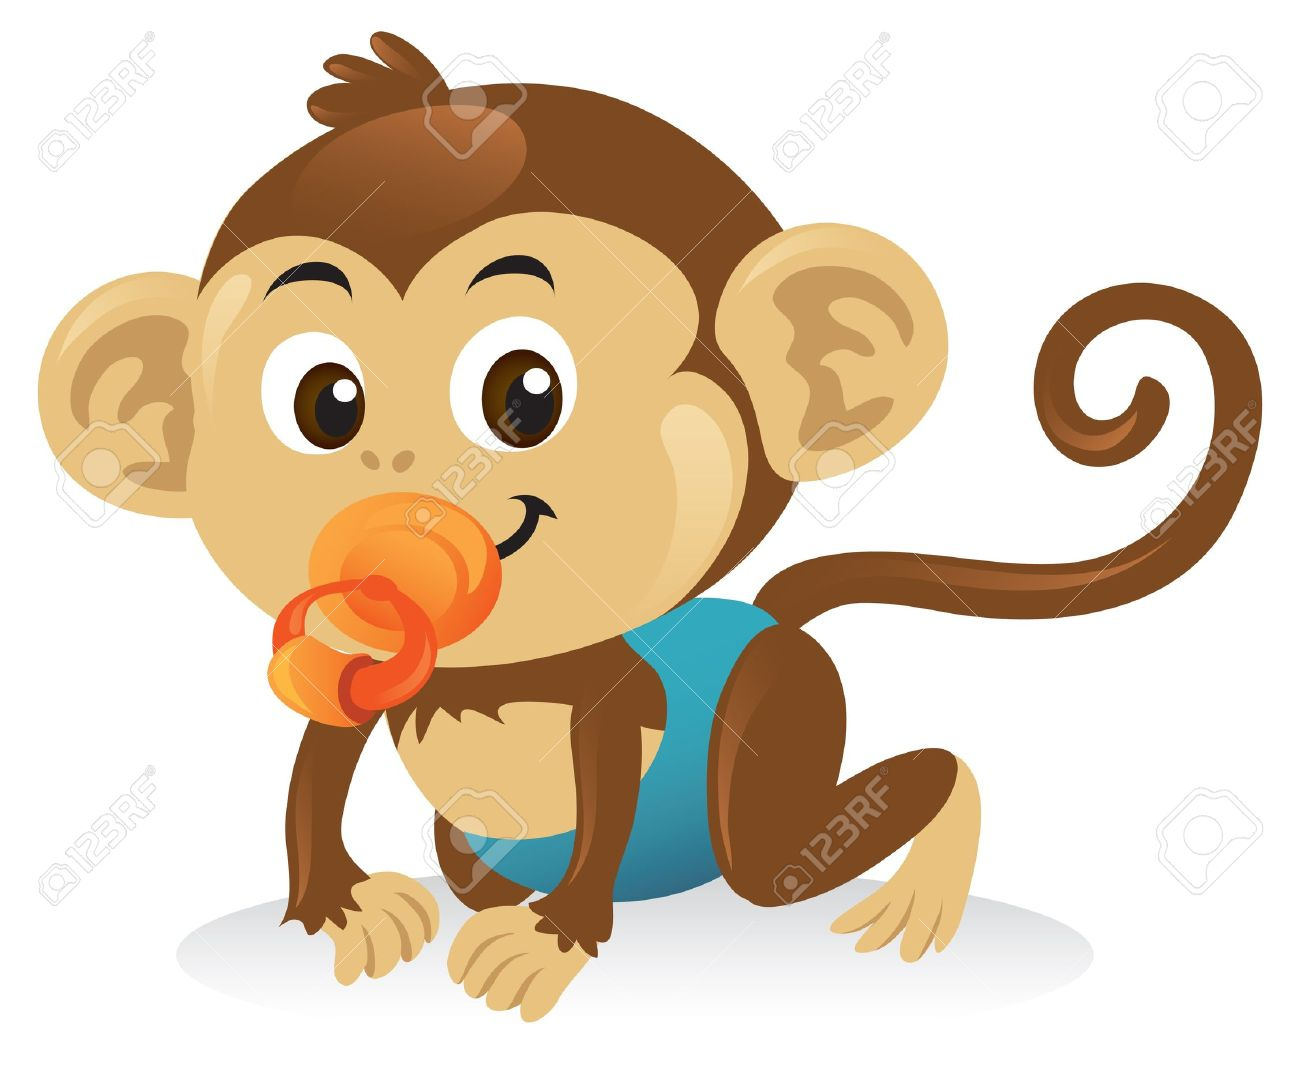 Monkey Clipart For Baby Shower Monkey Boy Baby Shower Theme